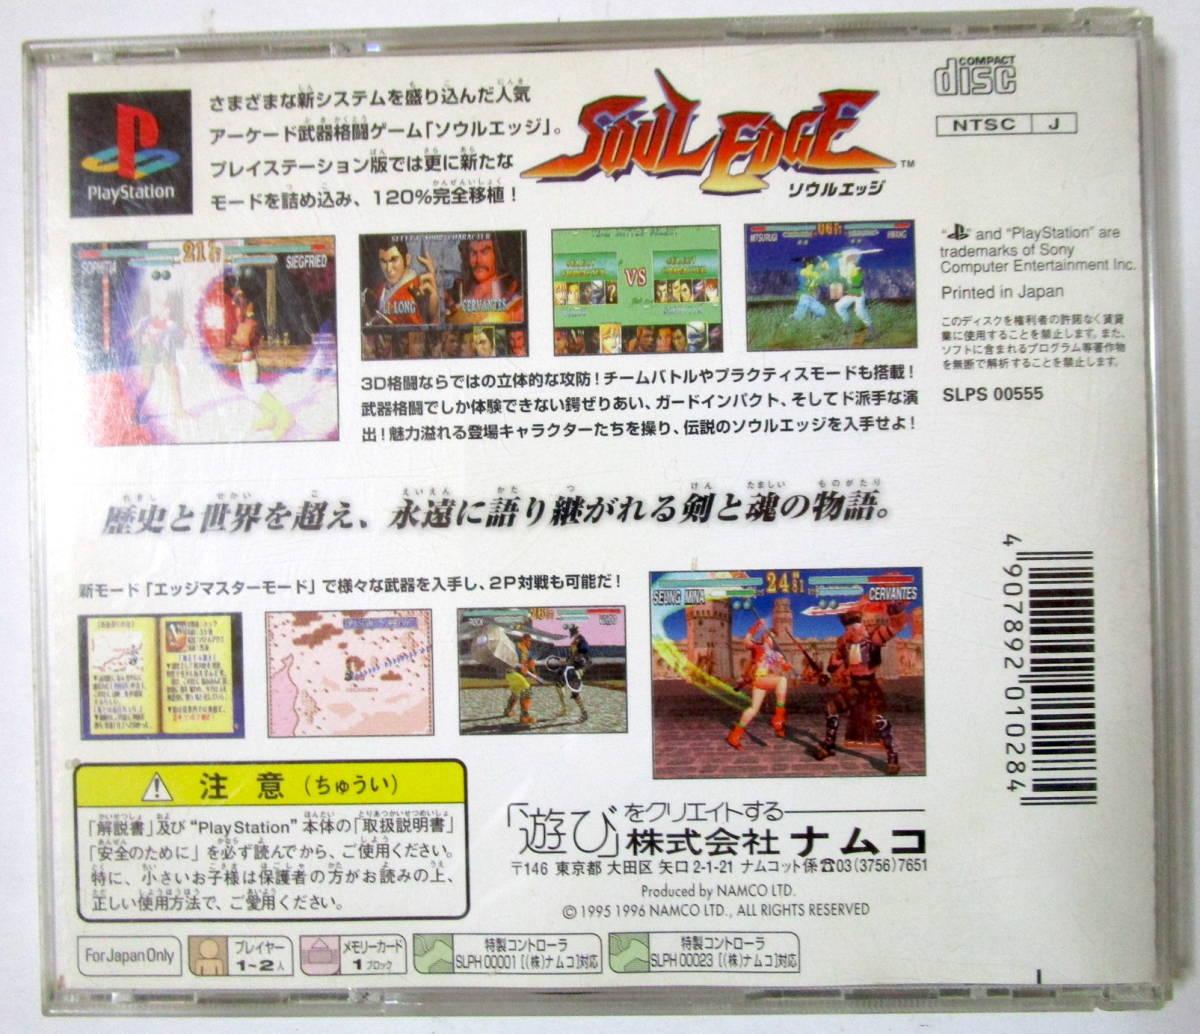 Sony Playstation PS1 Namco Soul Edge SLPS00555 ソニー プレイステーション ナムコ ソウルエッジ ソフト アーケード武器格闘ゲーム_画像2